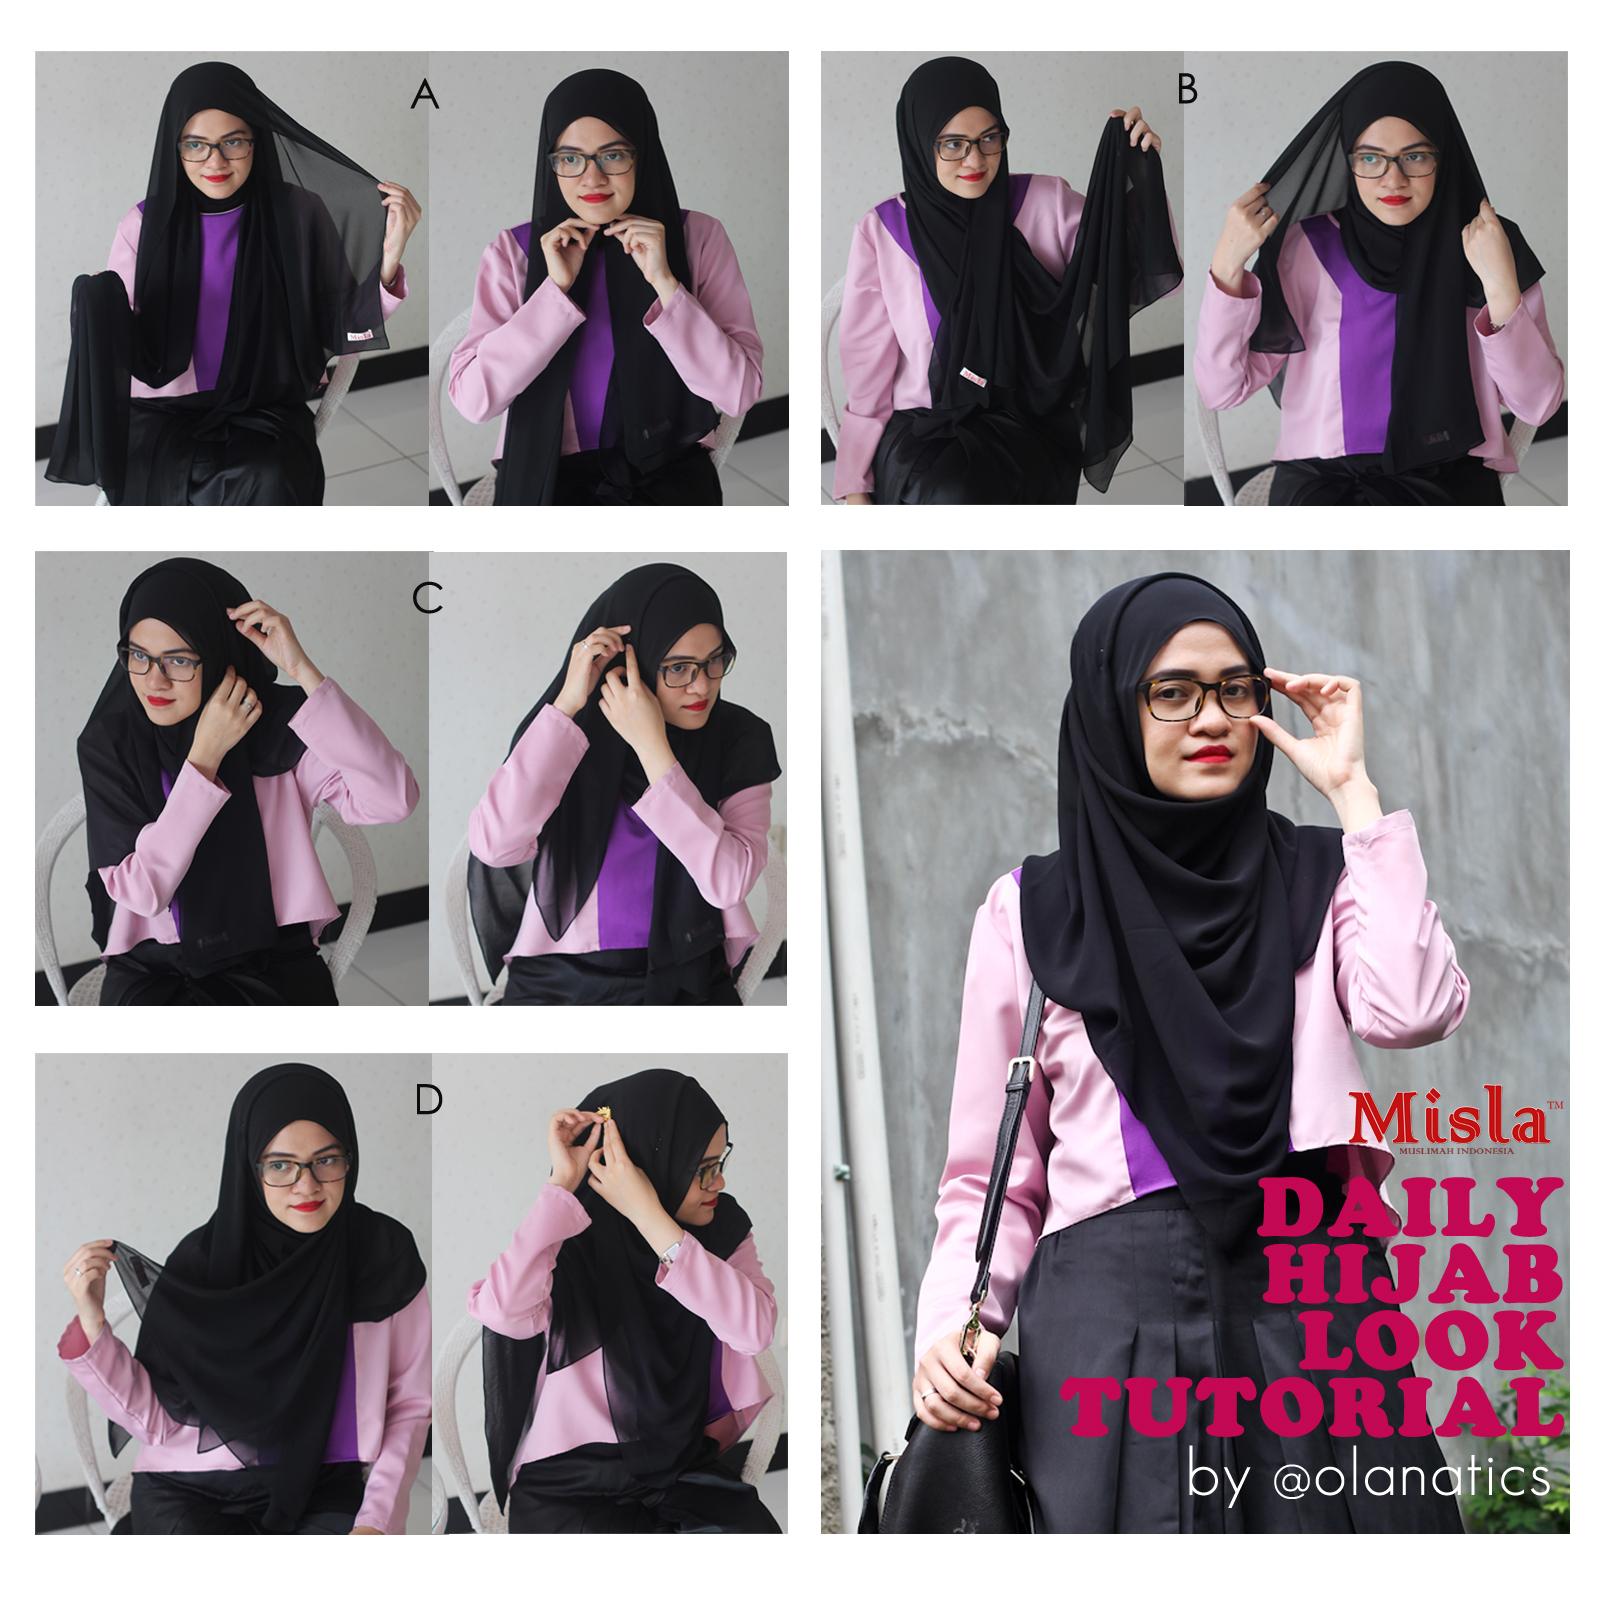 black-shawl-tutorial Tutorial: Daily Hijab Look